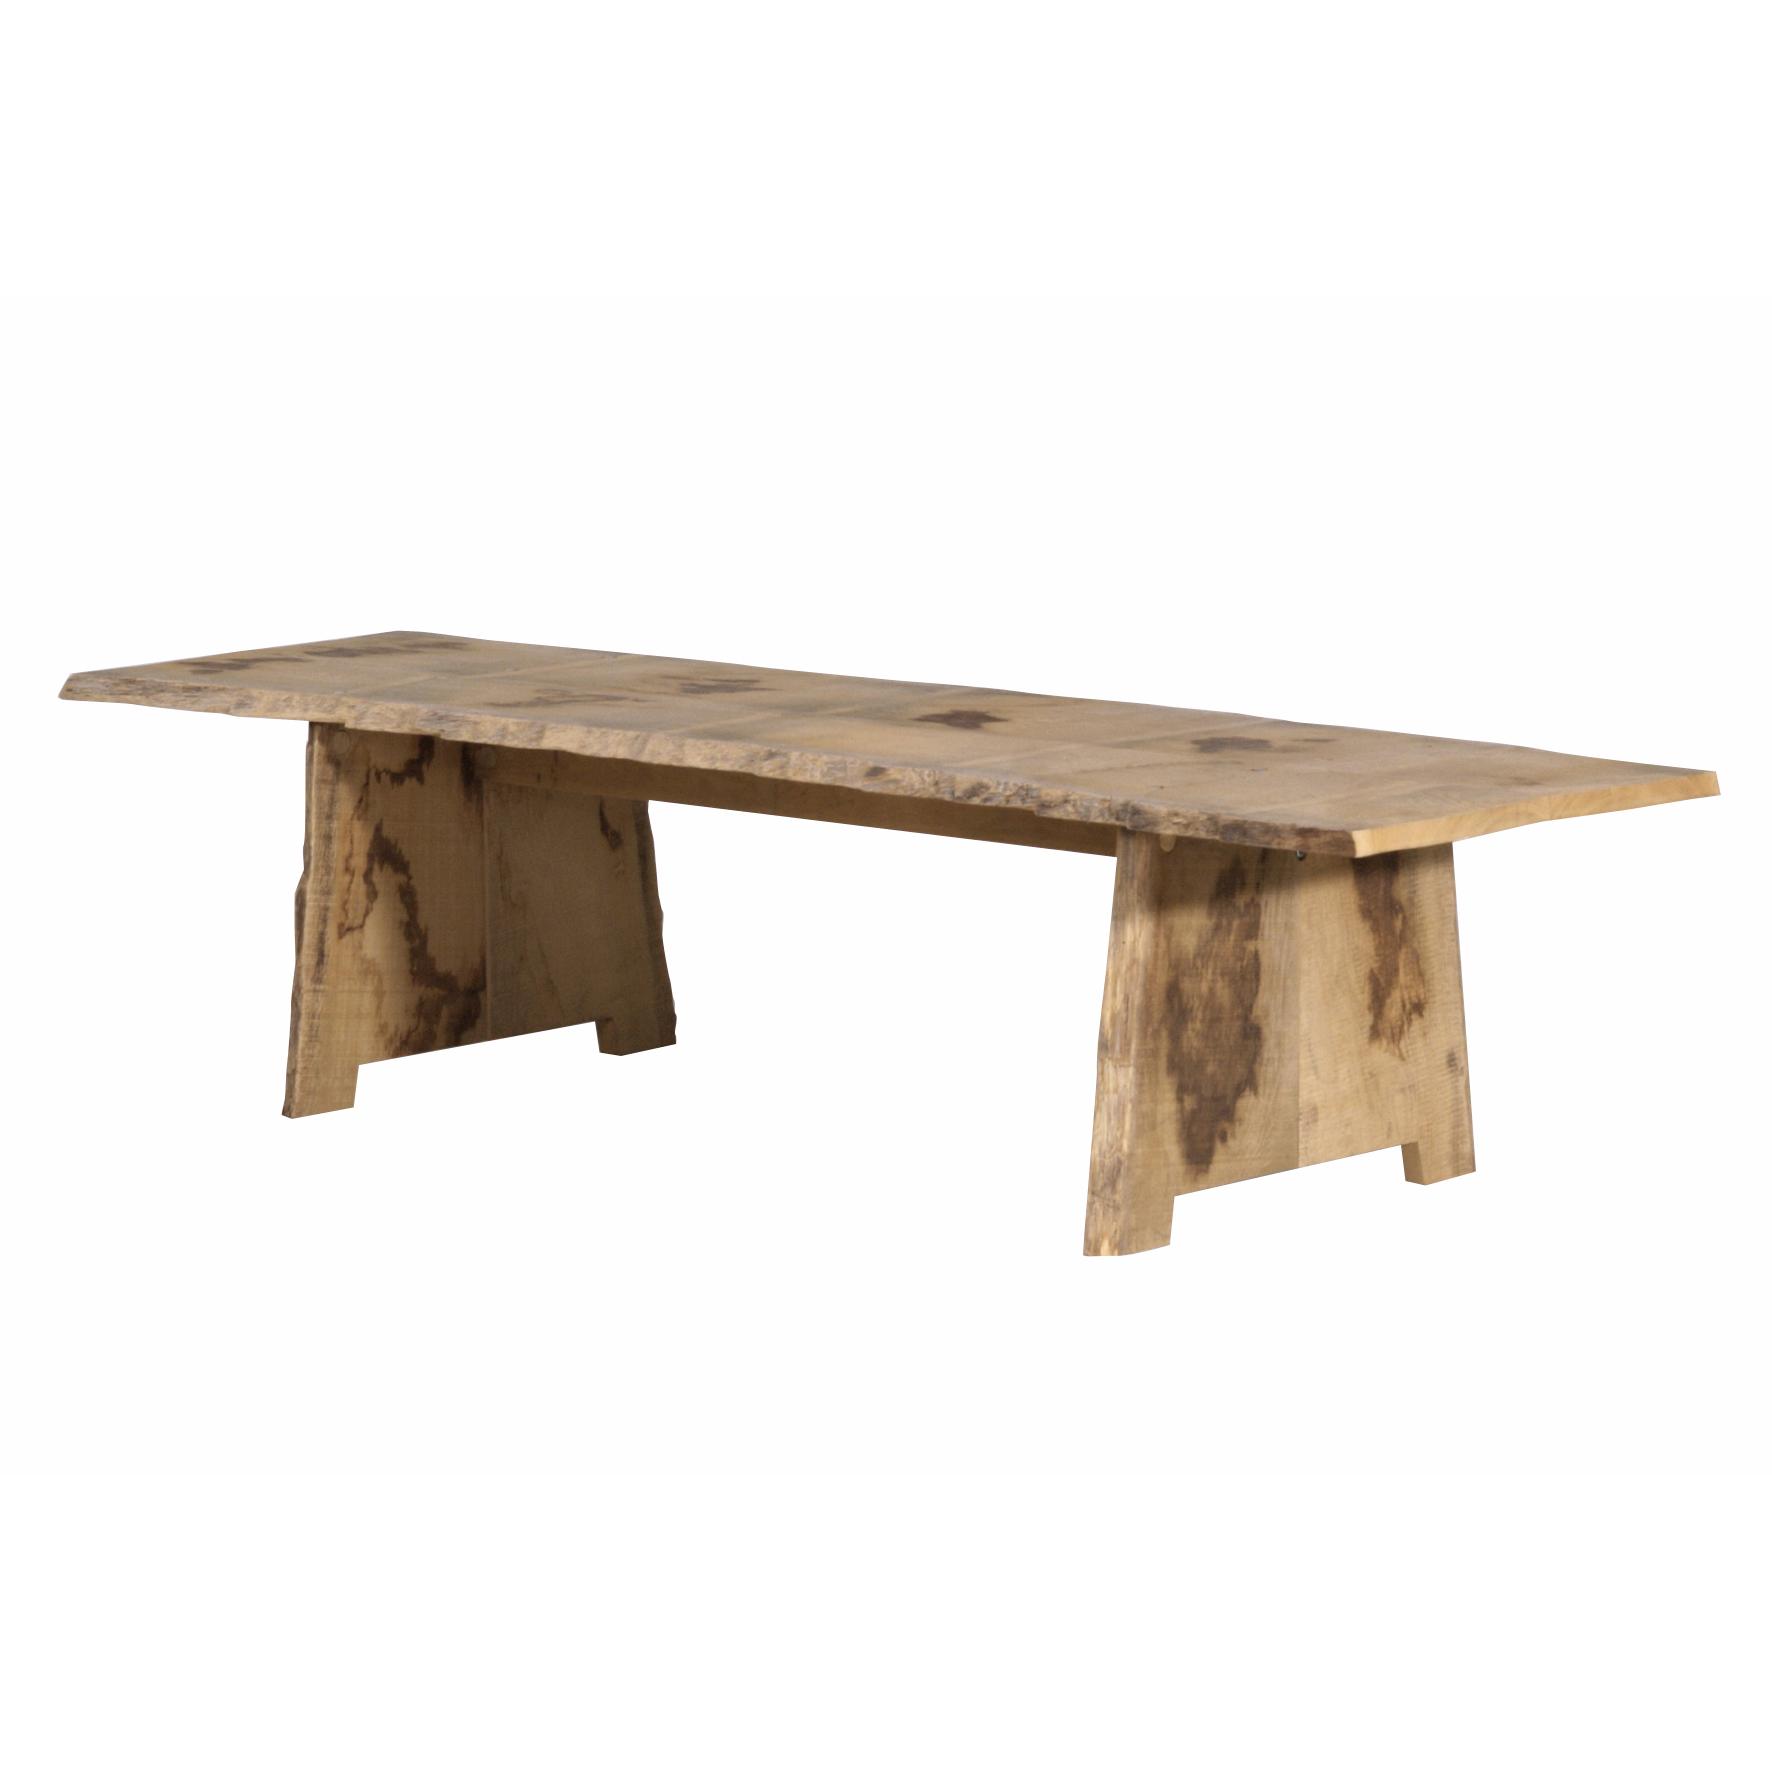 1811-boomstam-kindertafel